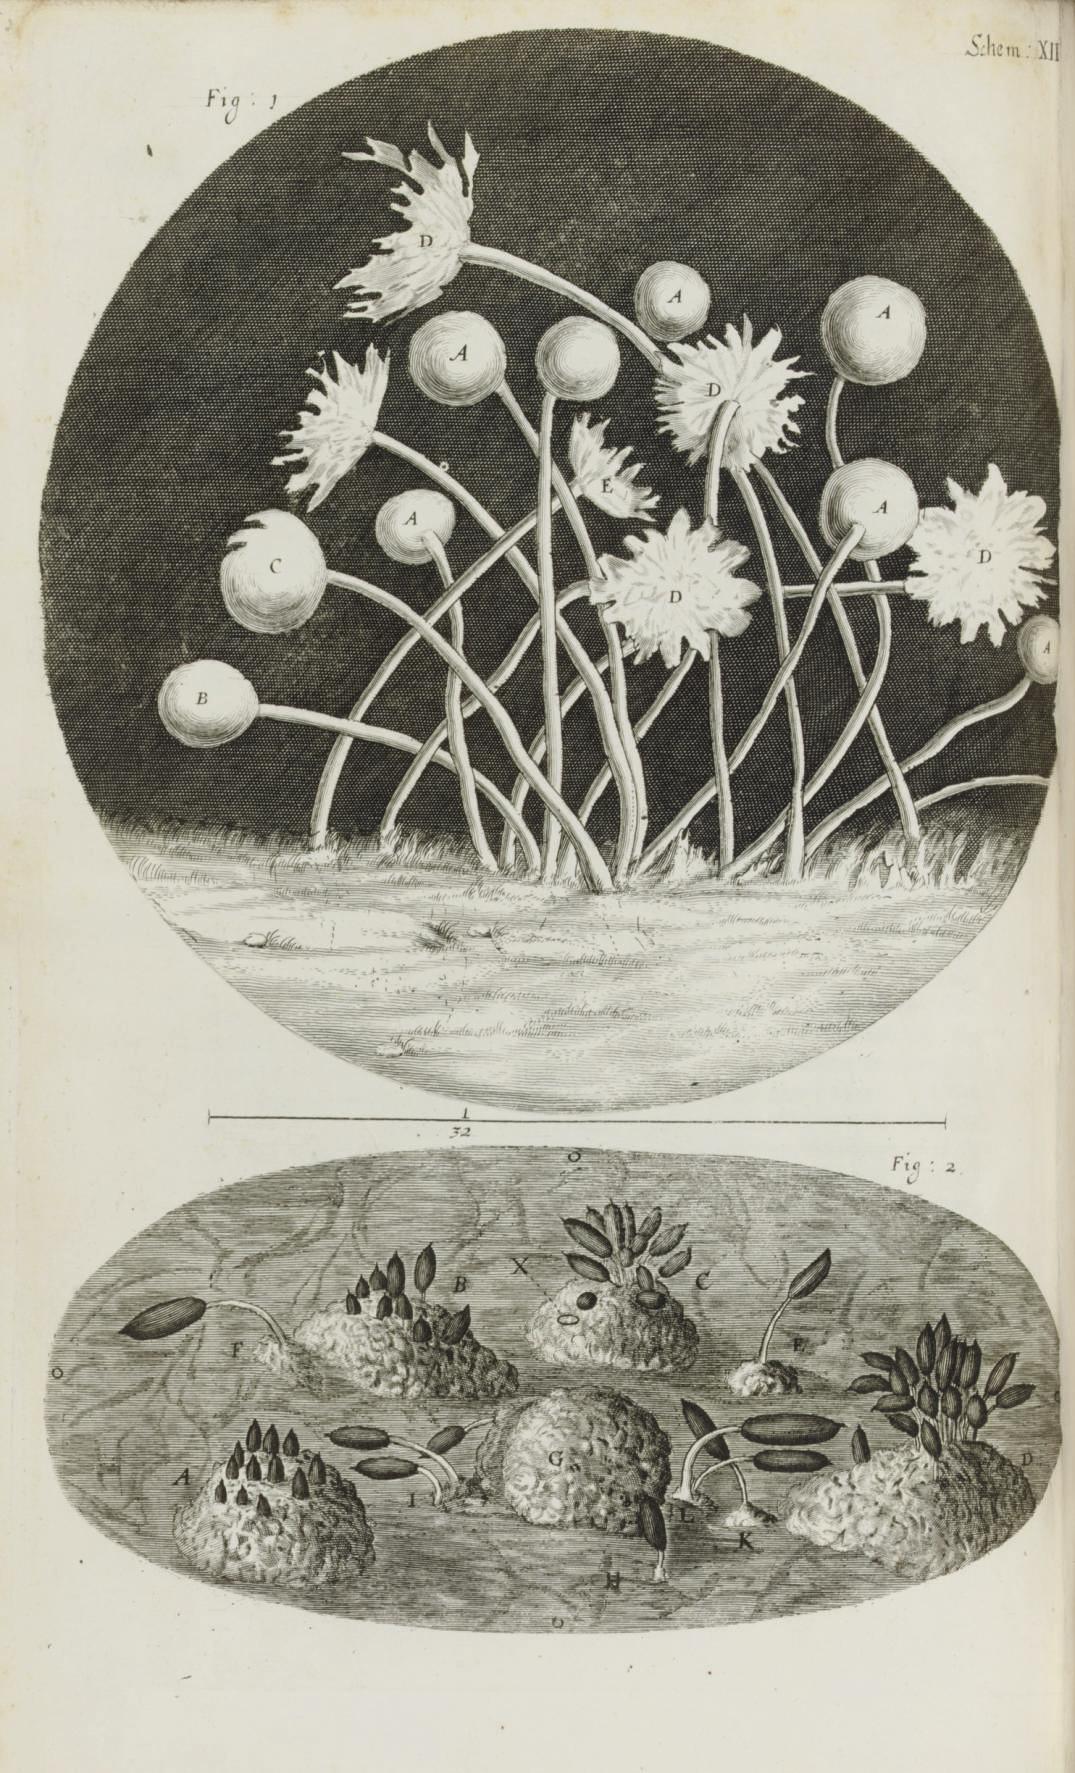 HOOKE, Robert (1635-1703). Mic